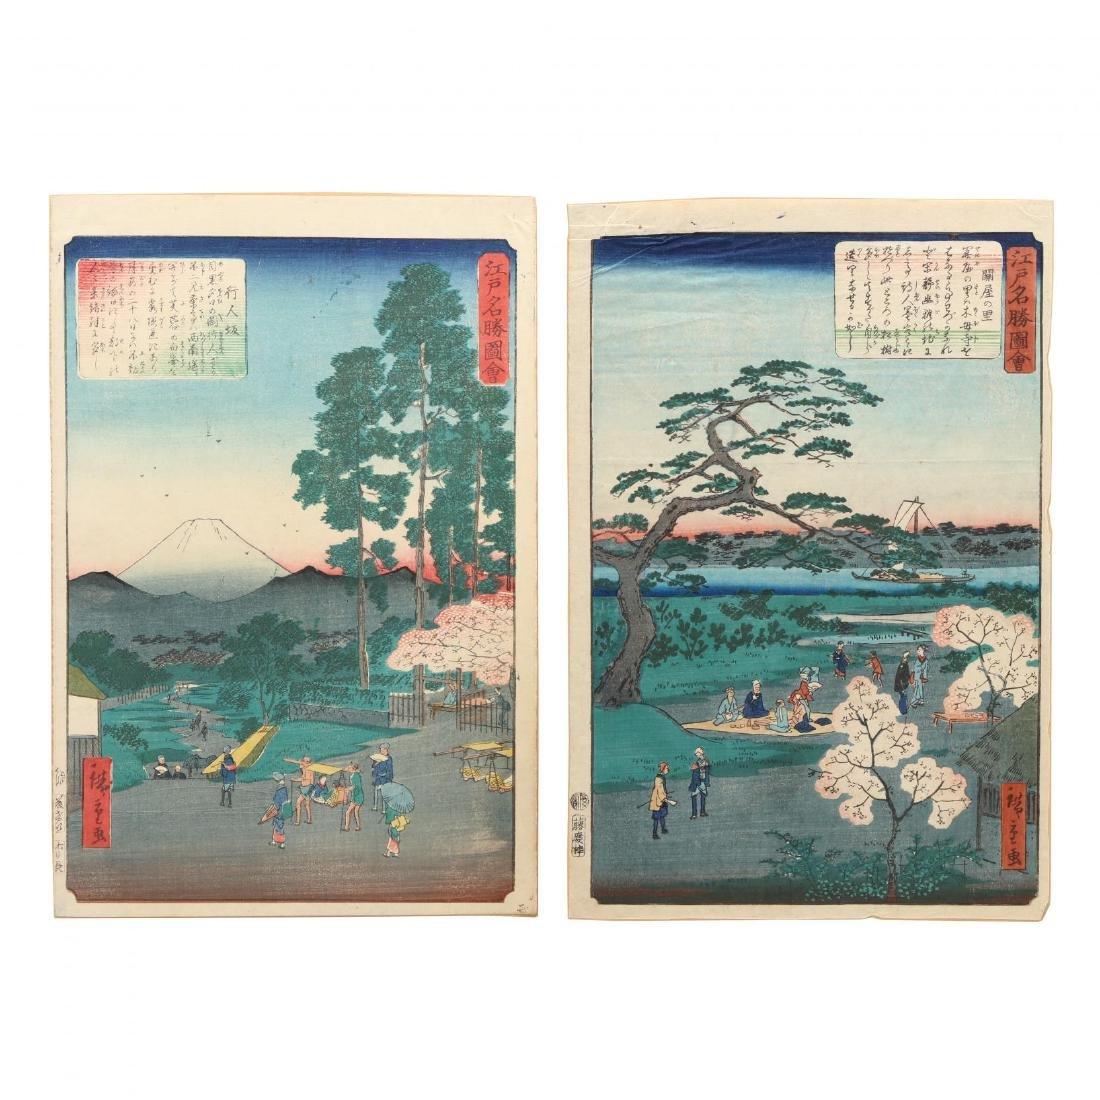 Two Woodblock Prints By Utagawa Hiroshige II (Japanese,